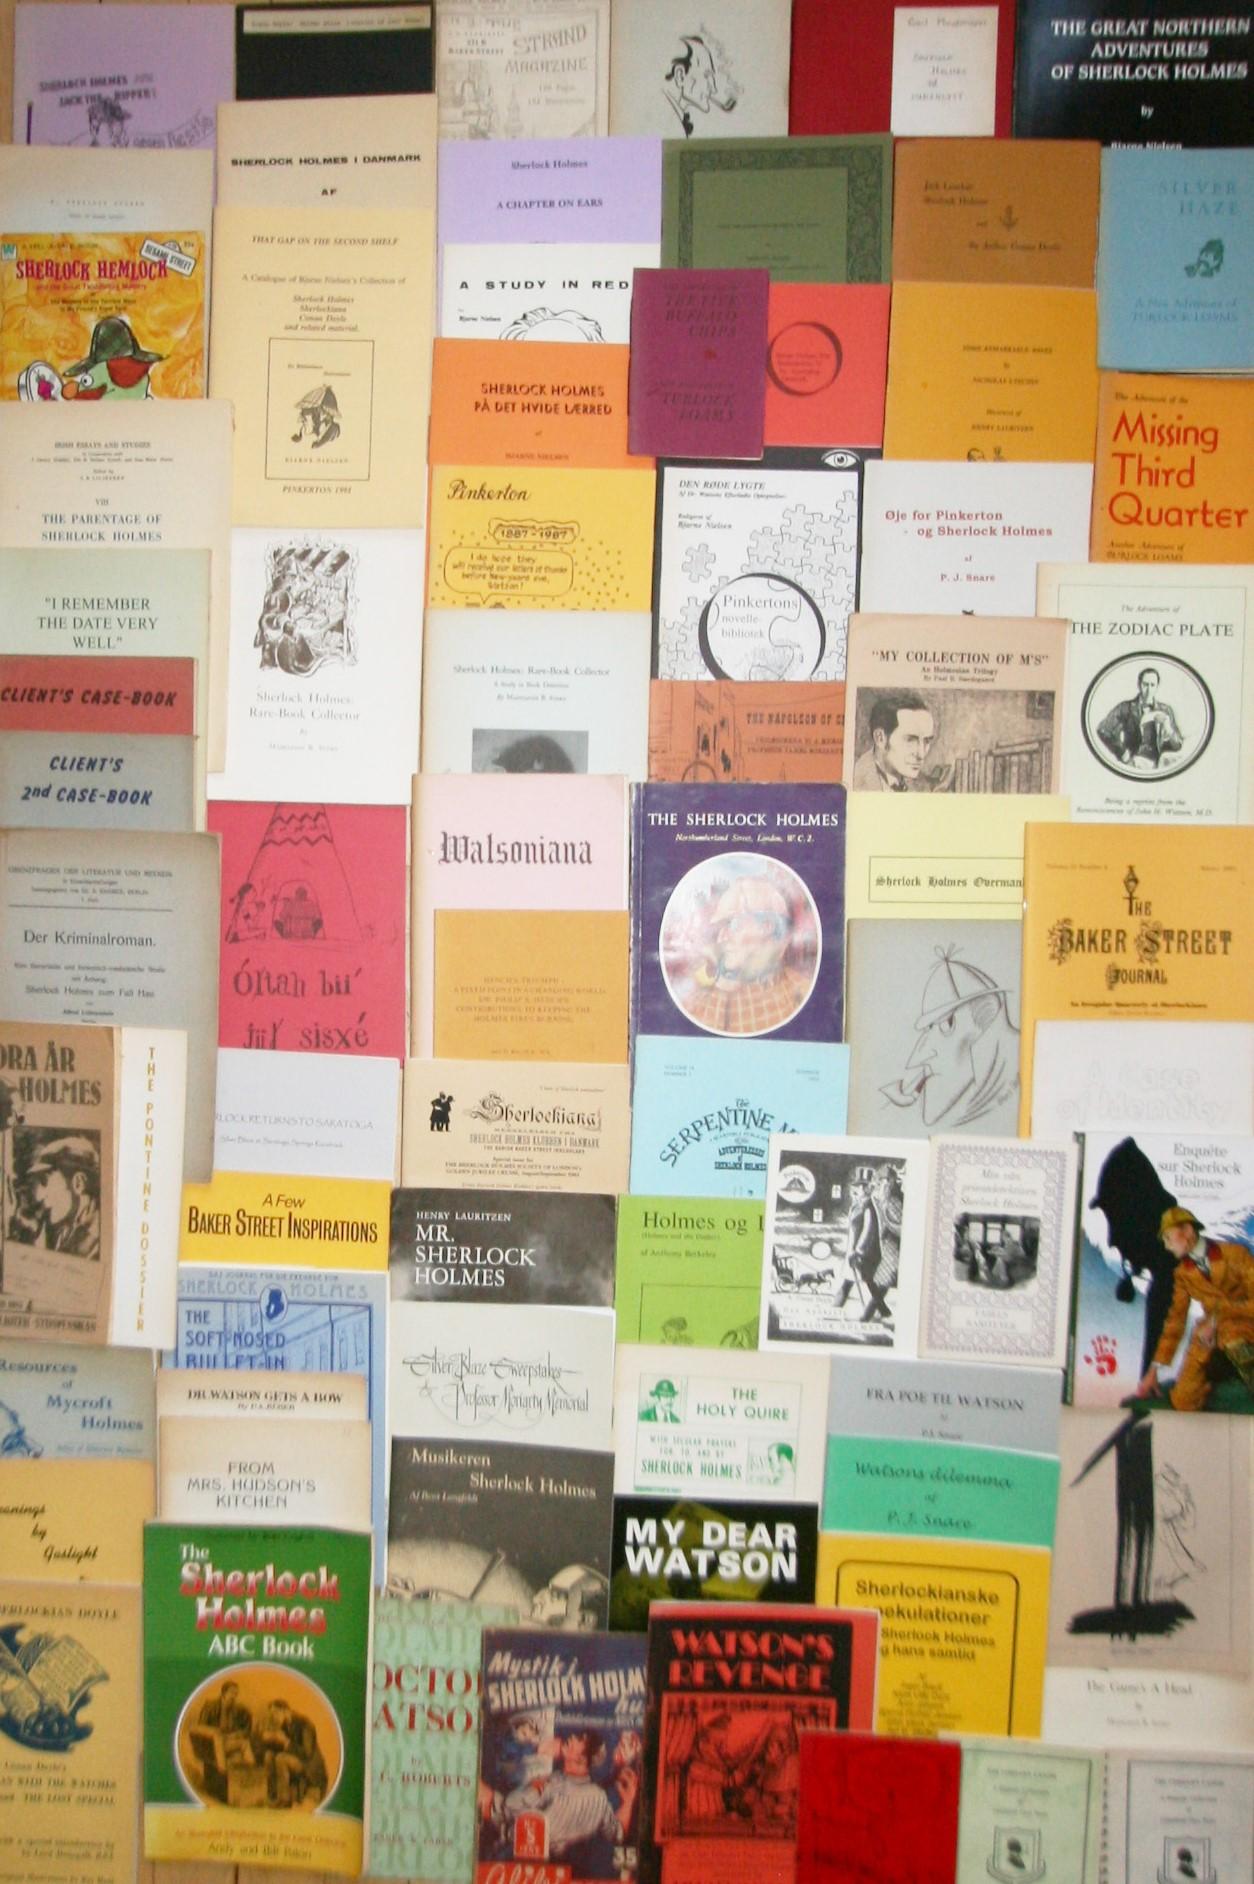 Sherlock Holmes samling